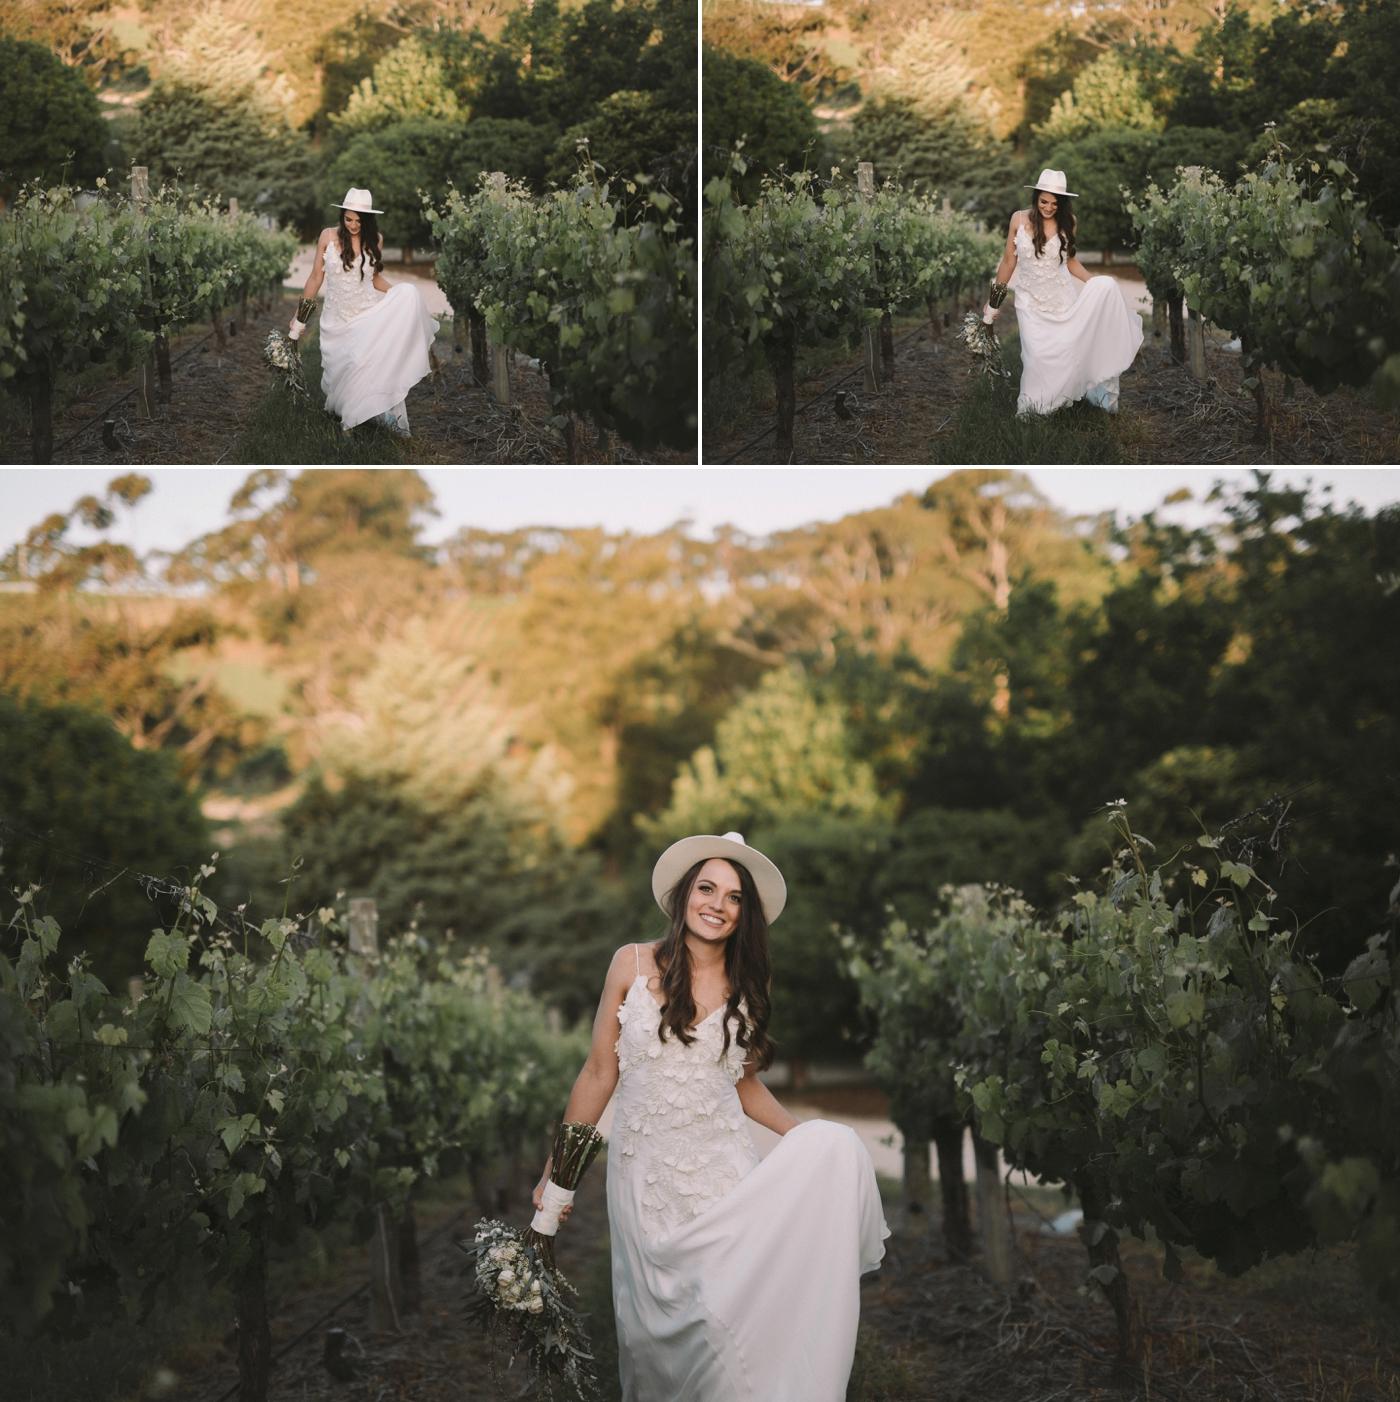 Maddy & Wes - K1 by Geoff Hardy Wedding - Adelaide Wedding Photographer - Natural wedding photography in Adelaide - Katherine Schultz_0065.jpg